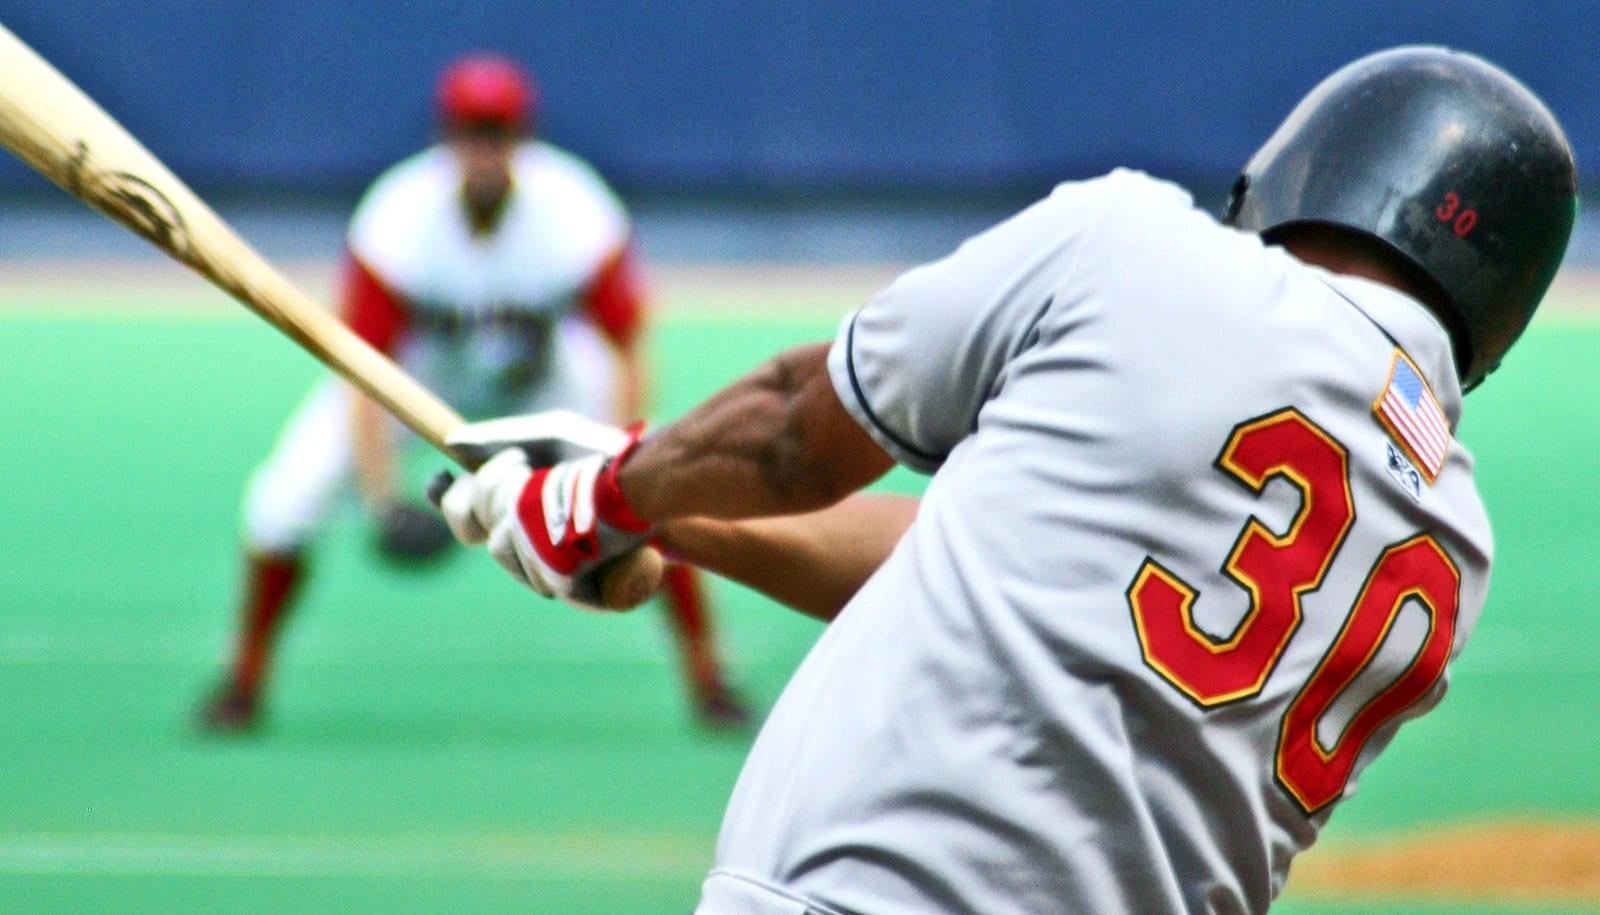 baseball player players league major futurity bmi overweight average